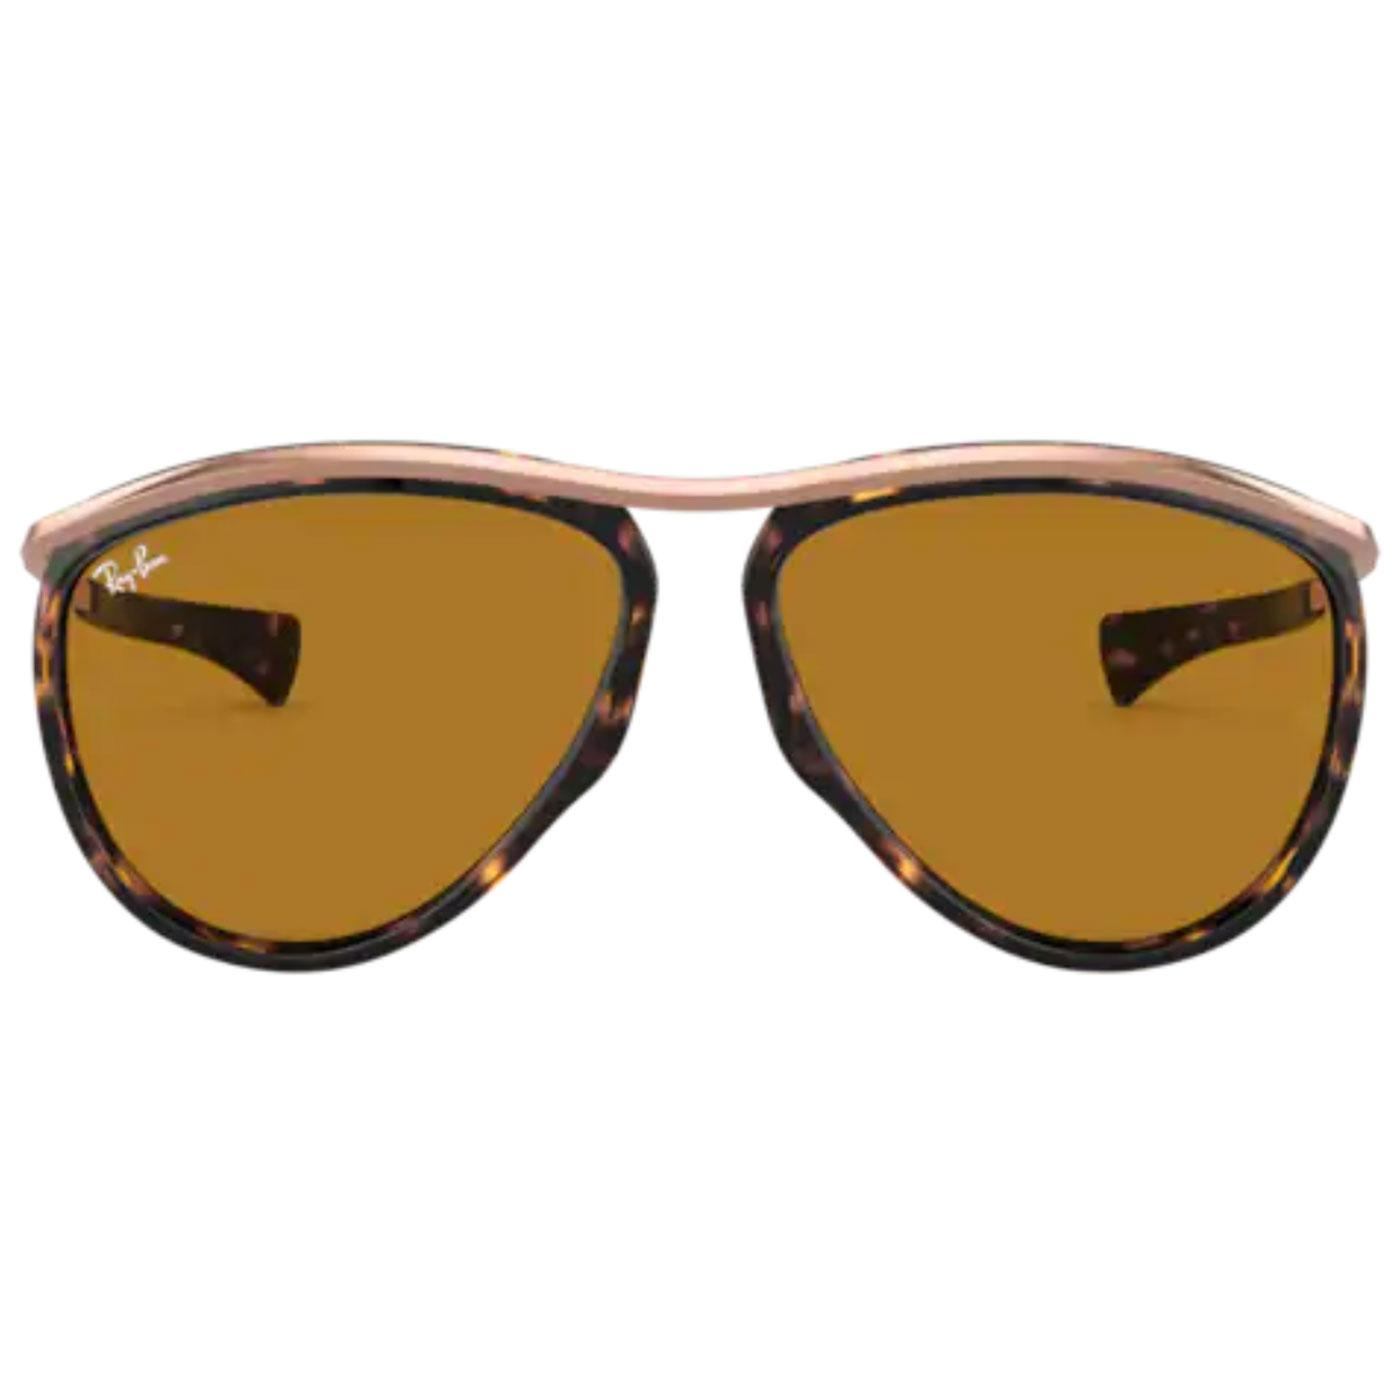 Olympian Aviator RAY-BAN Retro 60s Sunglasses HB